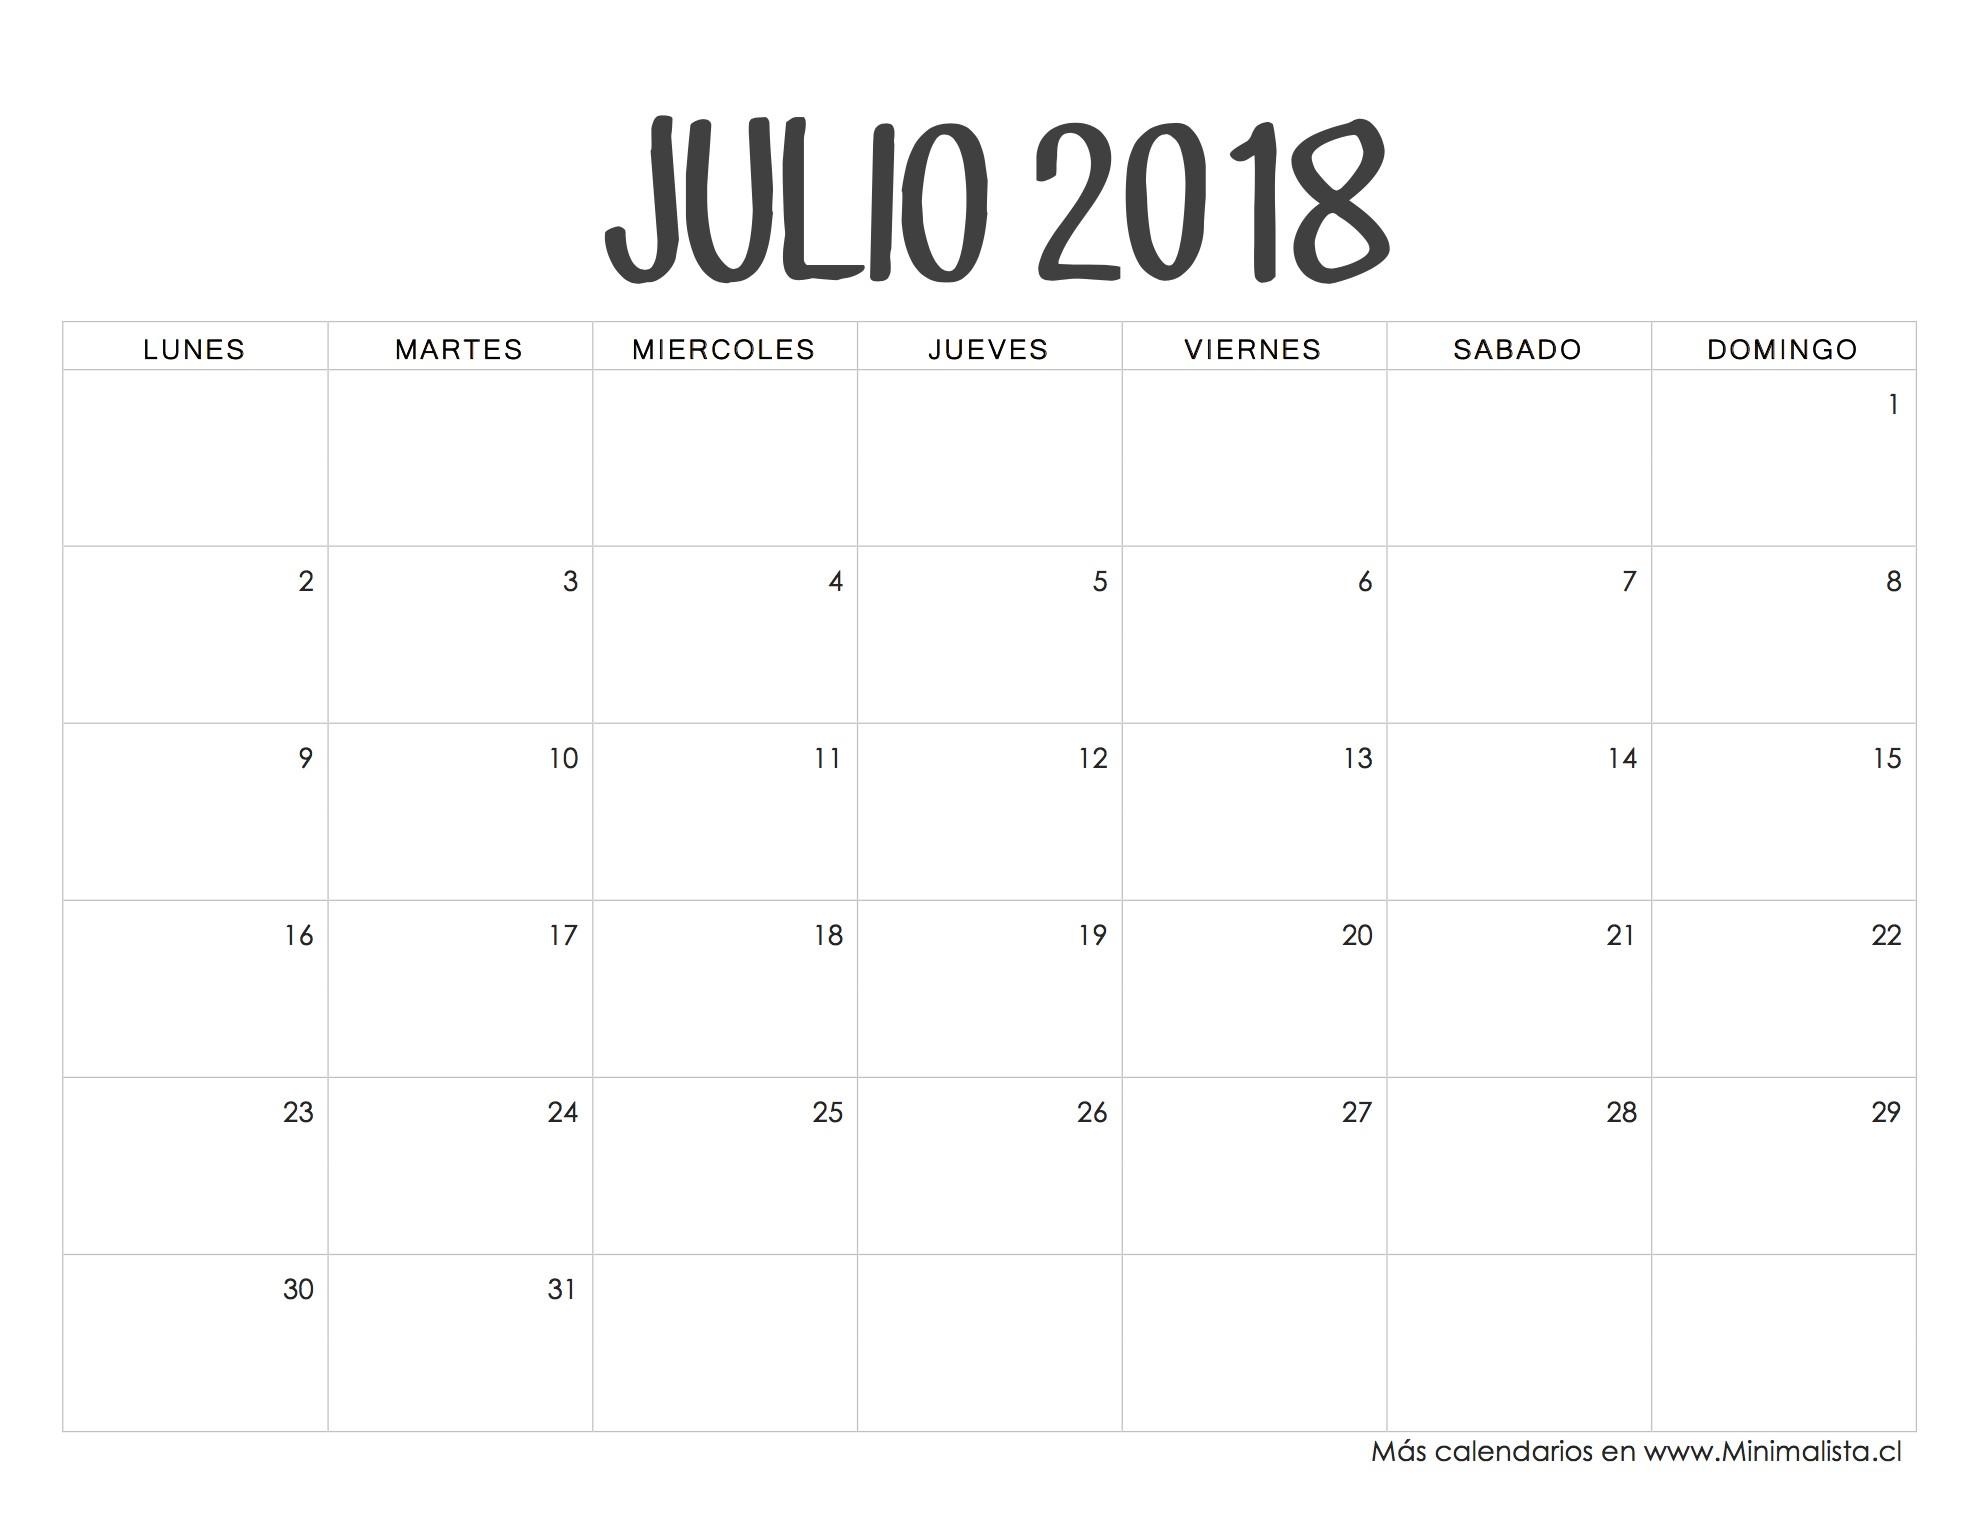 Calendario 2019 De Chile Con Feriados Para Imprimir Más Populares Calendario Julio 2019 Manualidades Pinterest Of Calendario 2019 De Chile Con Feriados Para Imprimir Actual Calendario 2017